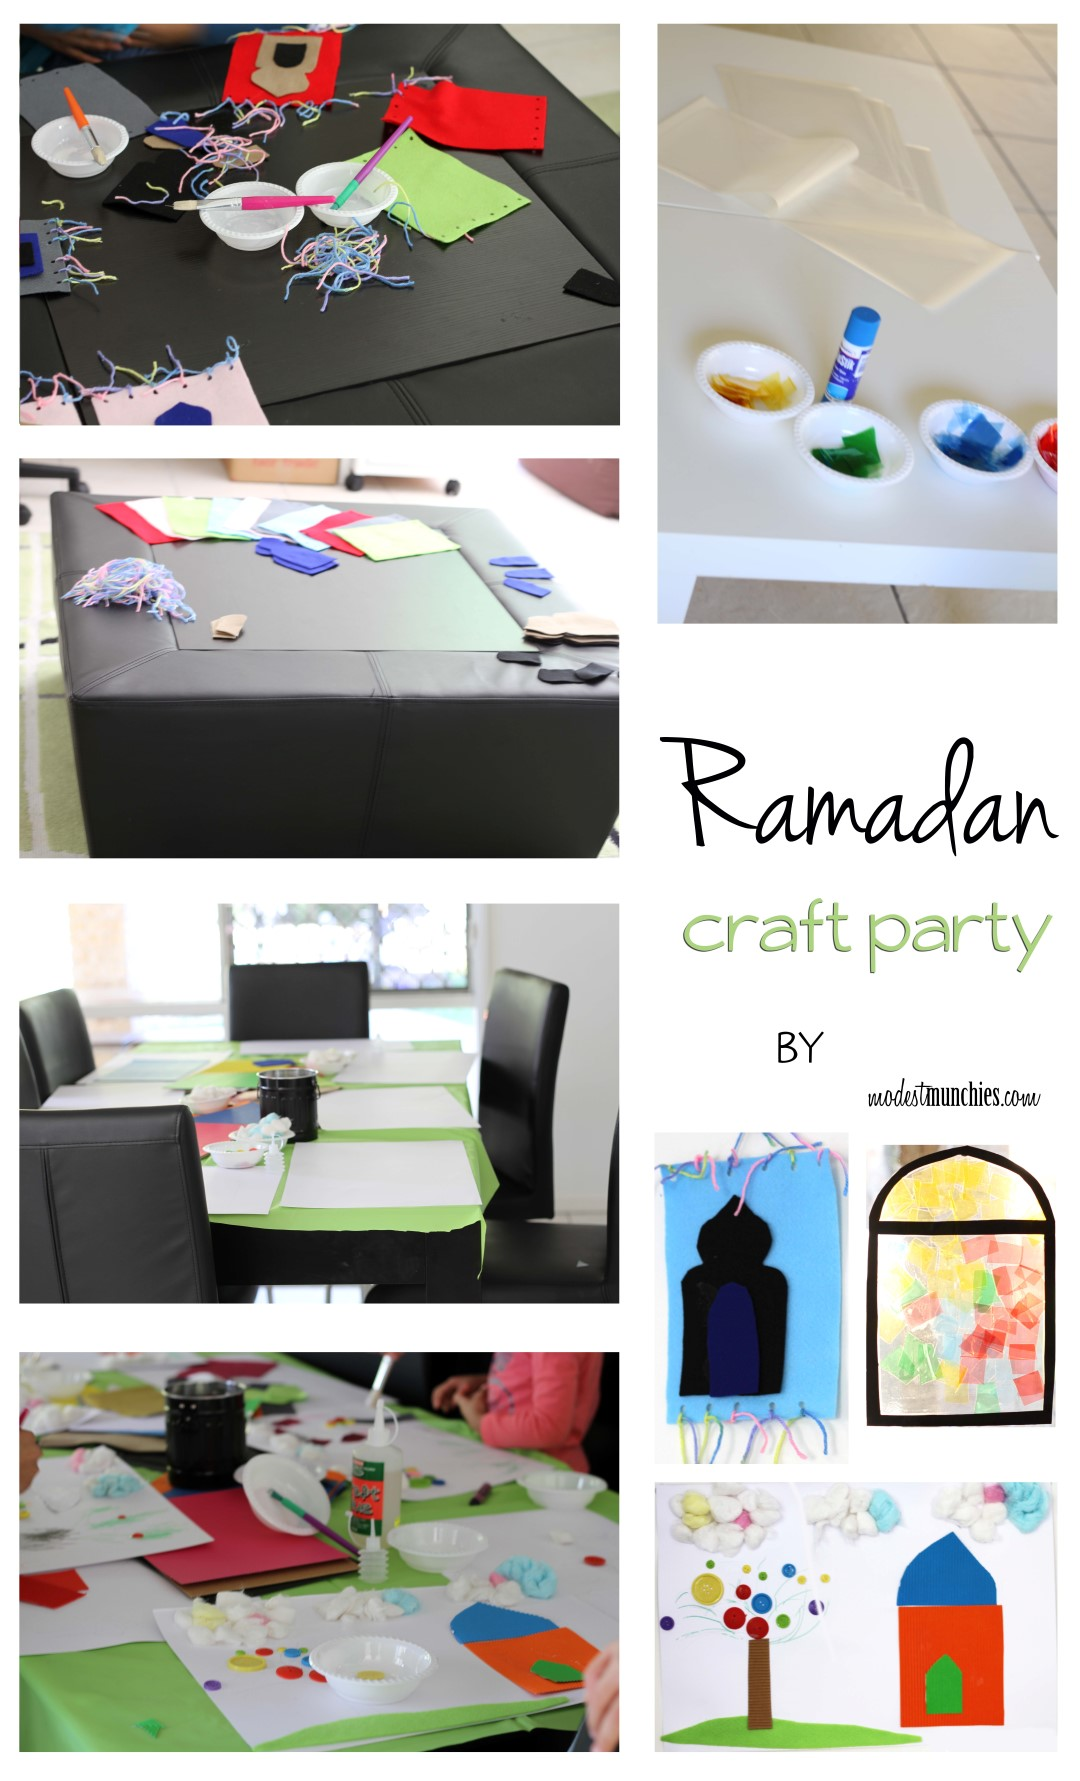 Ramadan craft party image (Large)